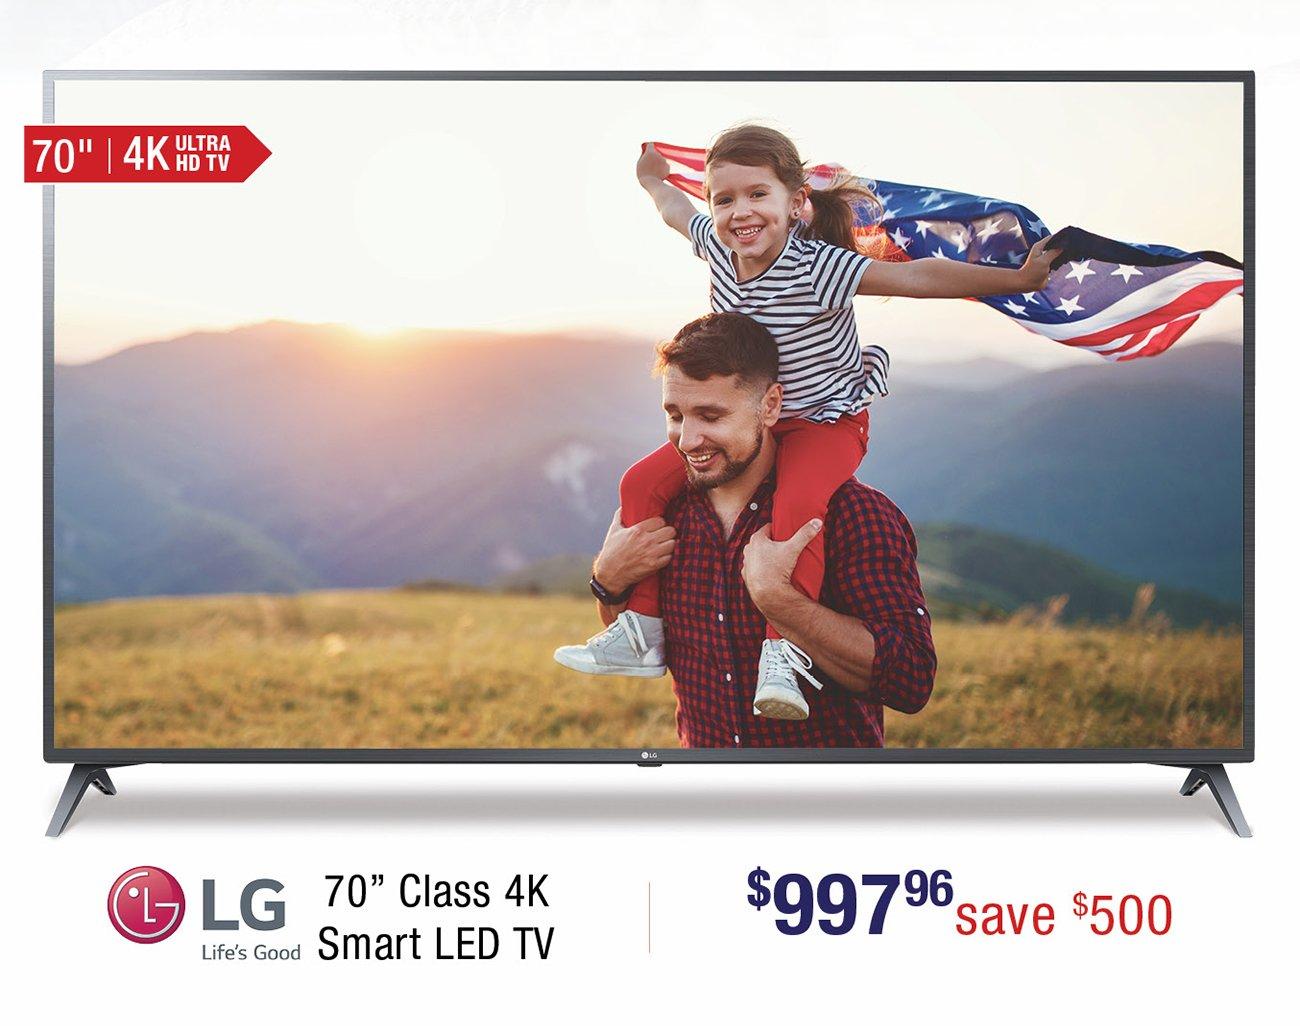 Lg-70-inch-4k-tv